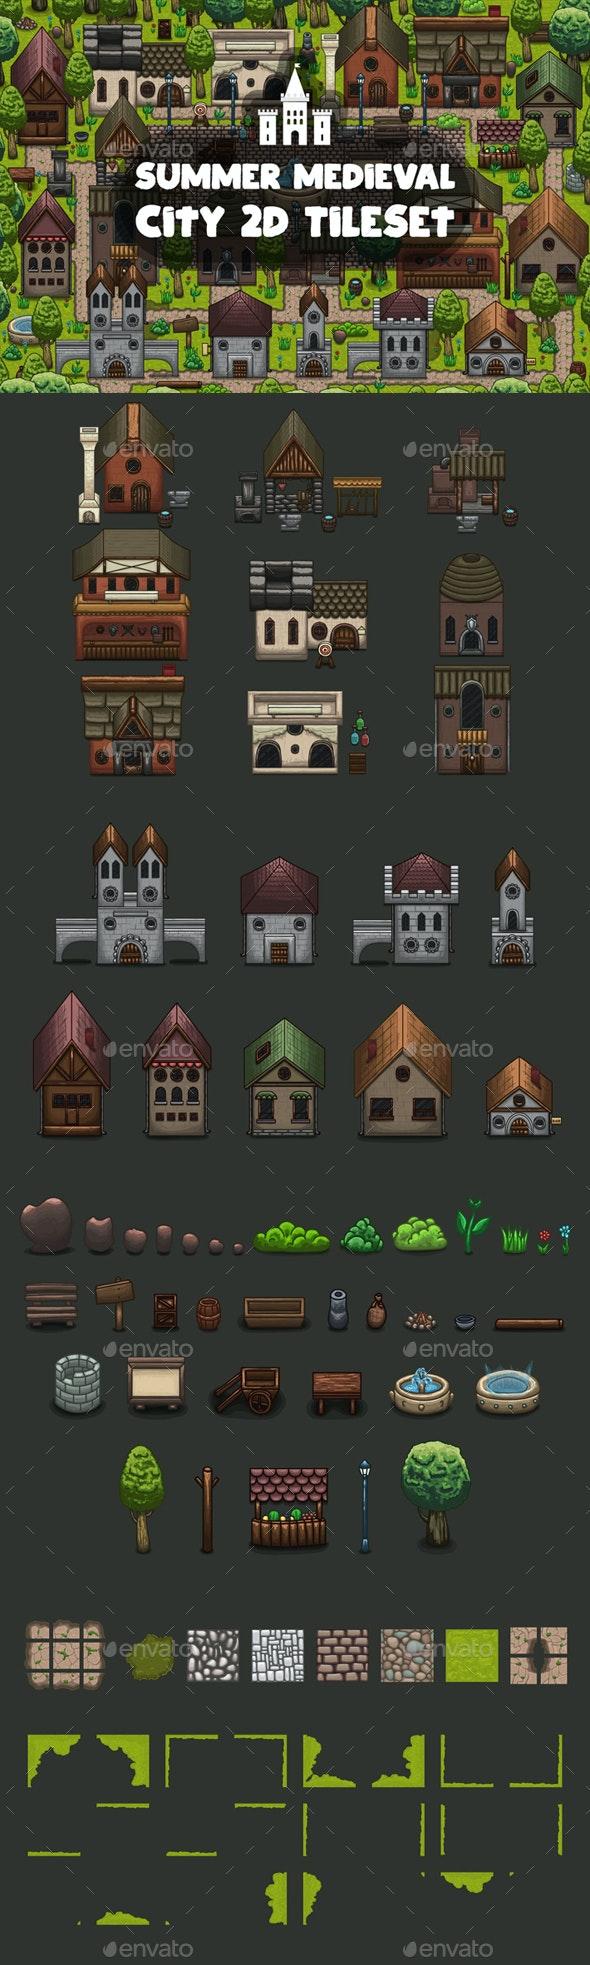 Summer Medieval City Game Tileset - Tilesets Game Assets